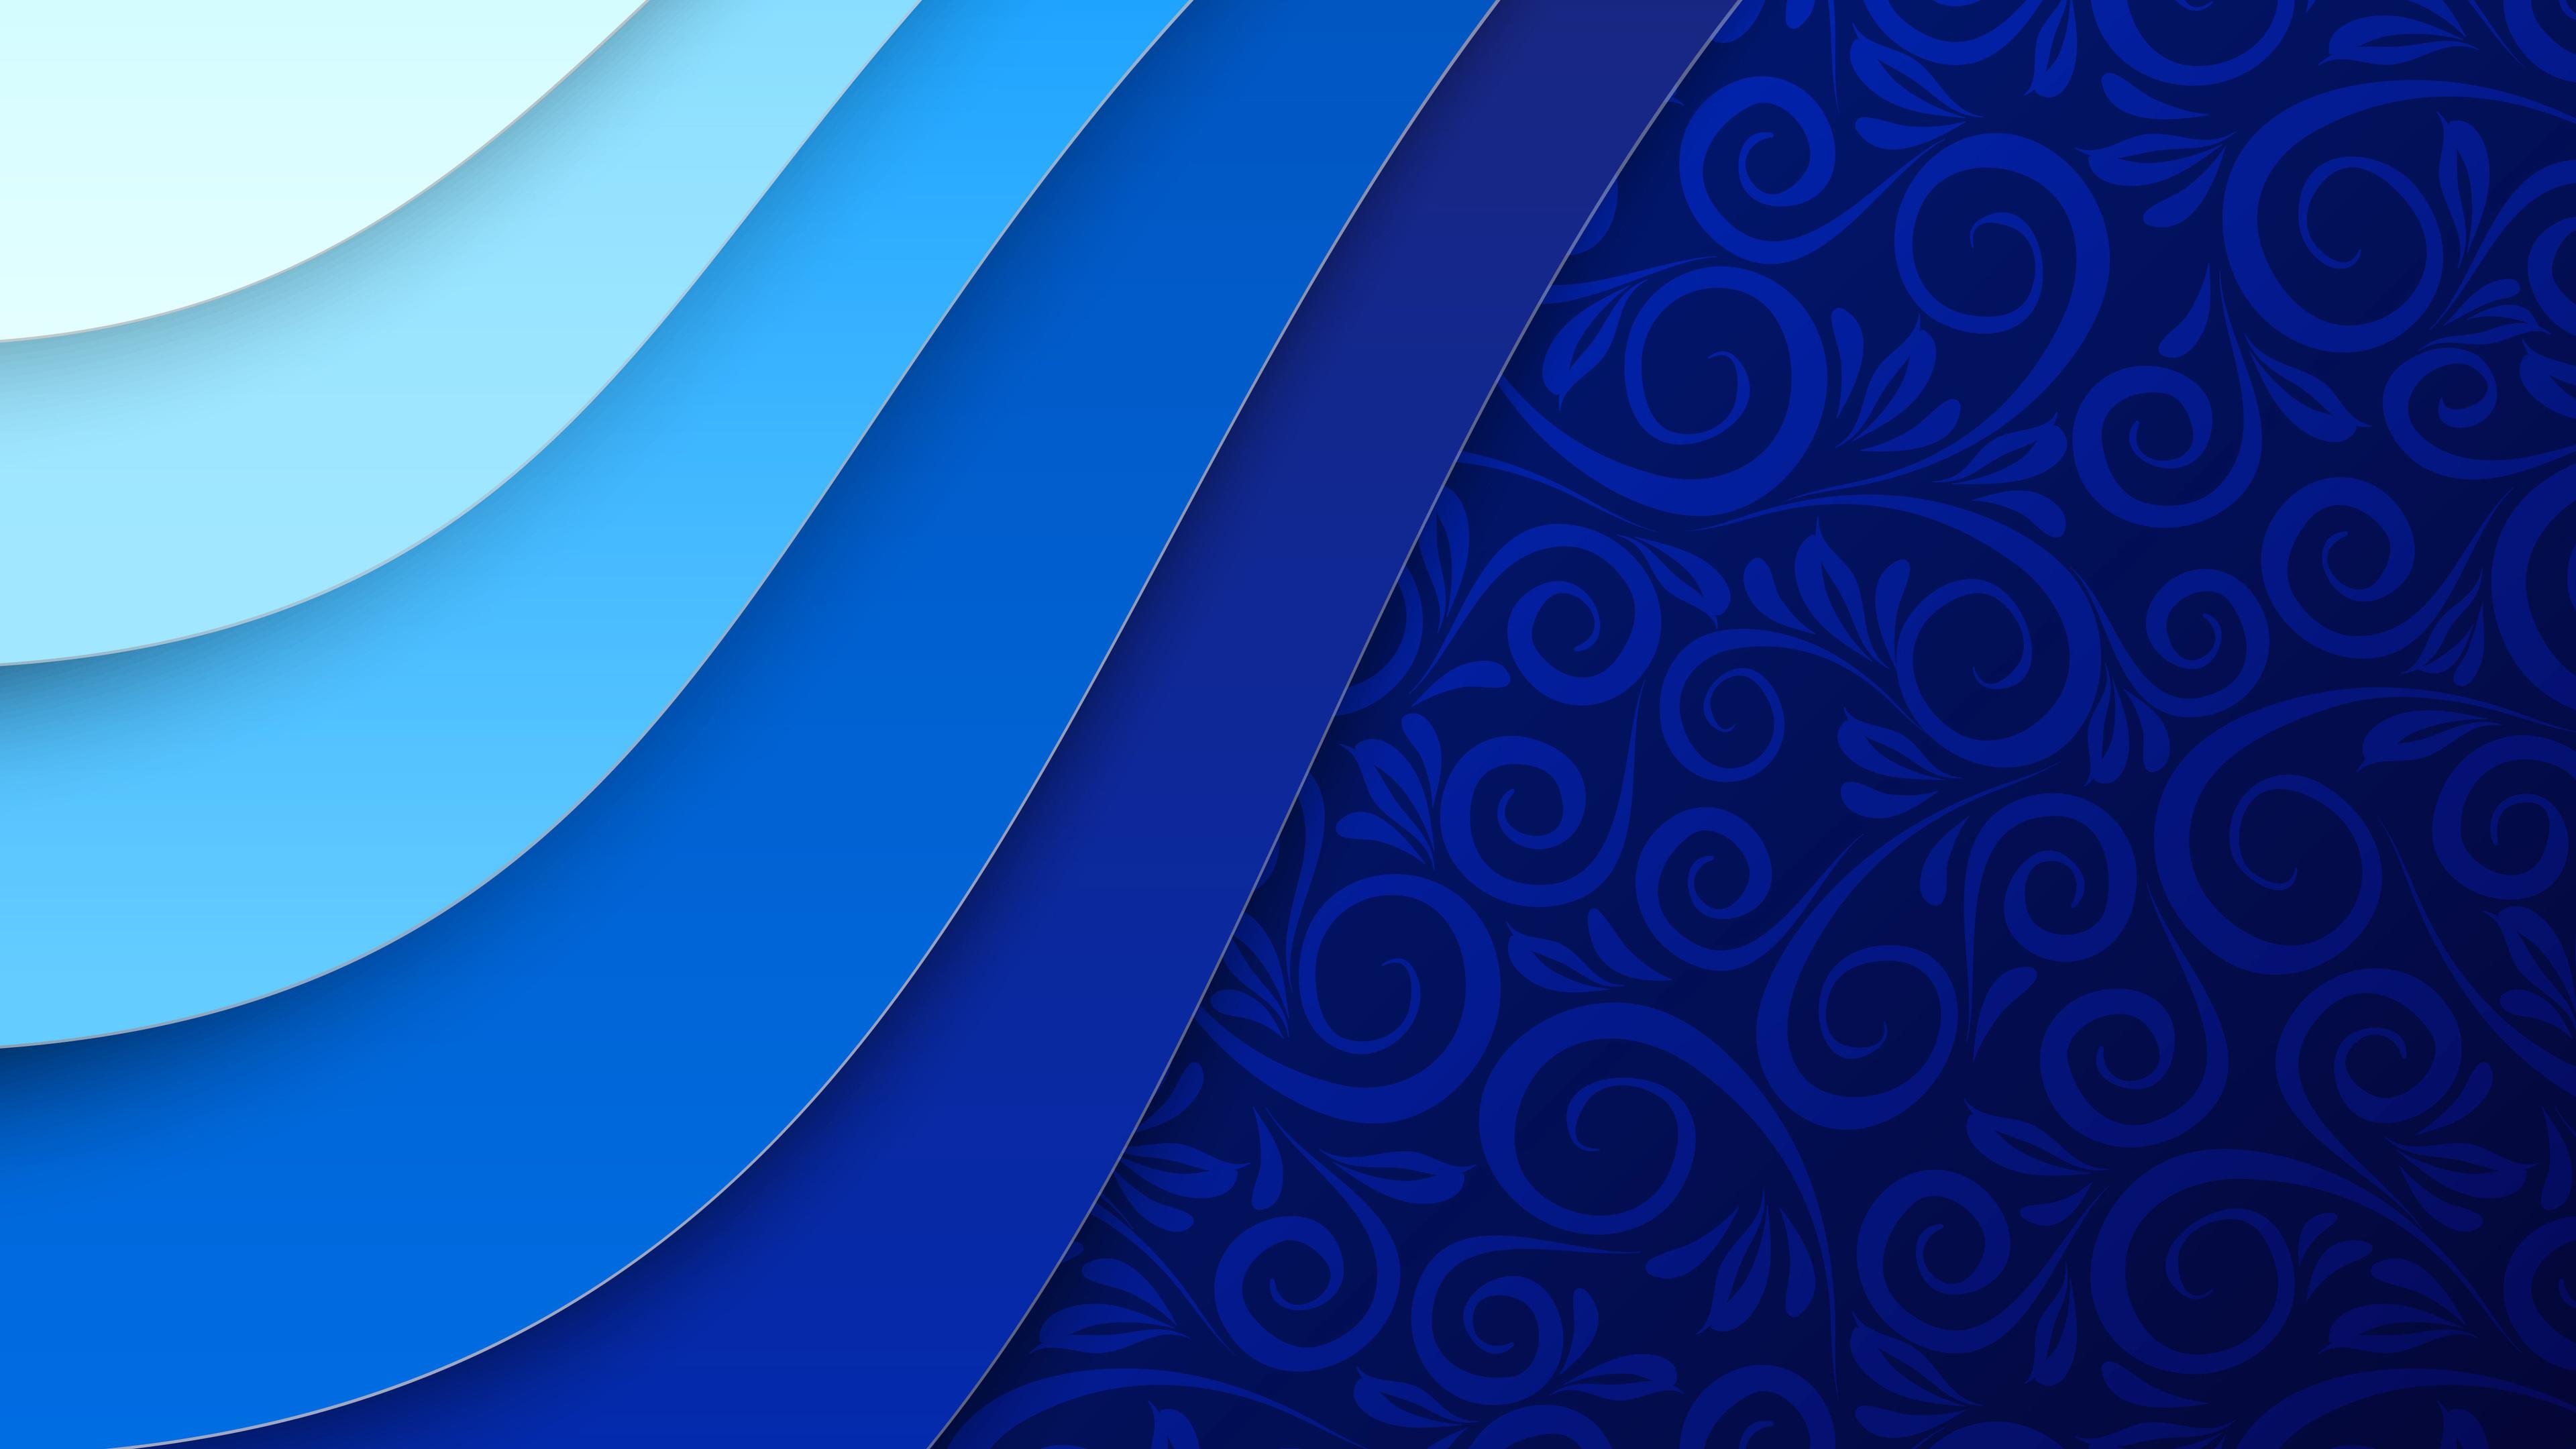 abstract blue texture 5k 1539371397 - Abstract Blue Texture 5k - texture wallpapers, hd-wallpapers, blue wallpapers, abstract wallpapers, 5k wallpapers, 4k-wallpapers